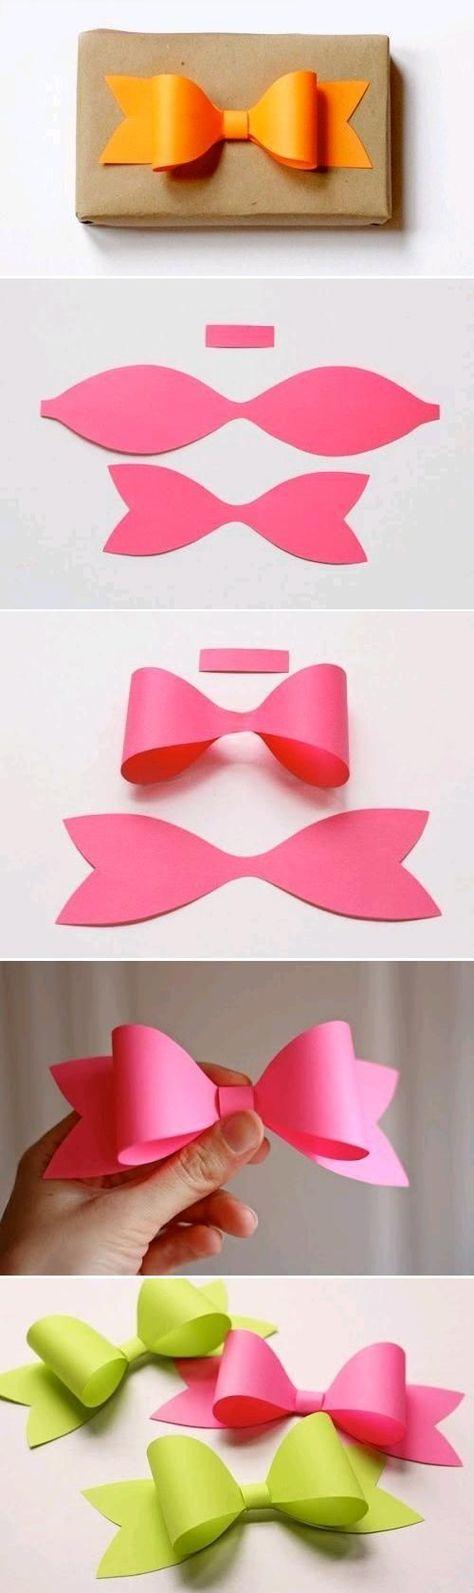 Awesome DIY Modular Bow.